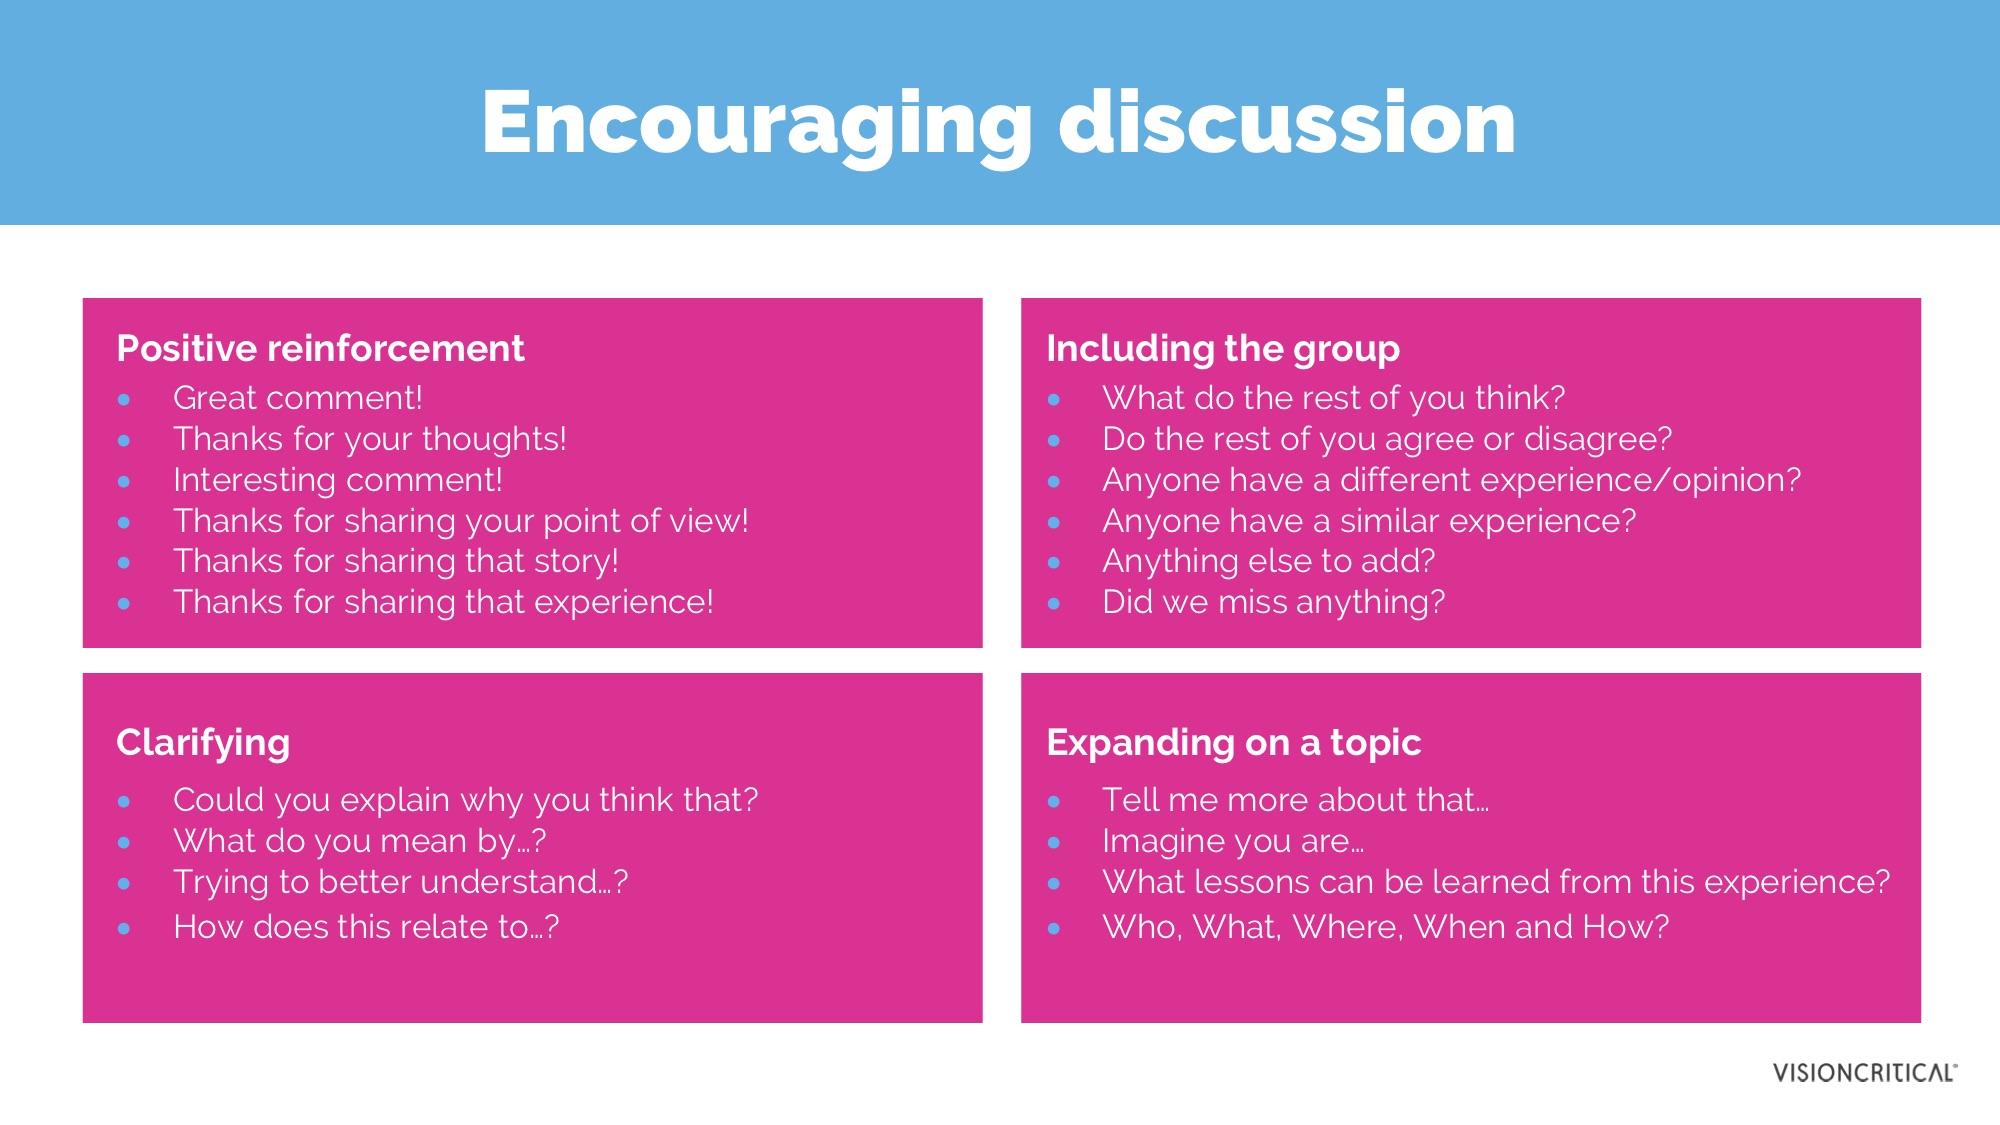 Encouraging discussion